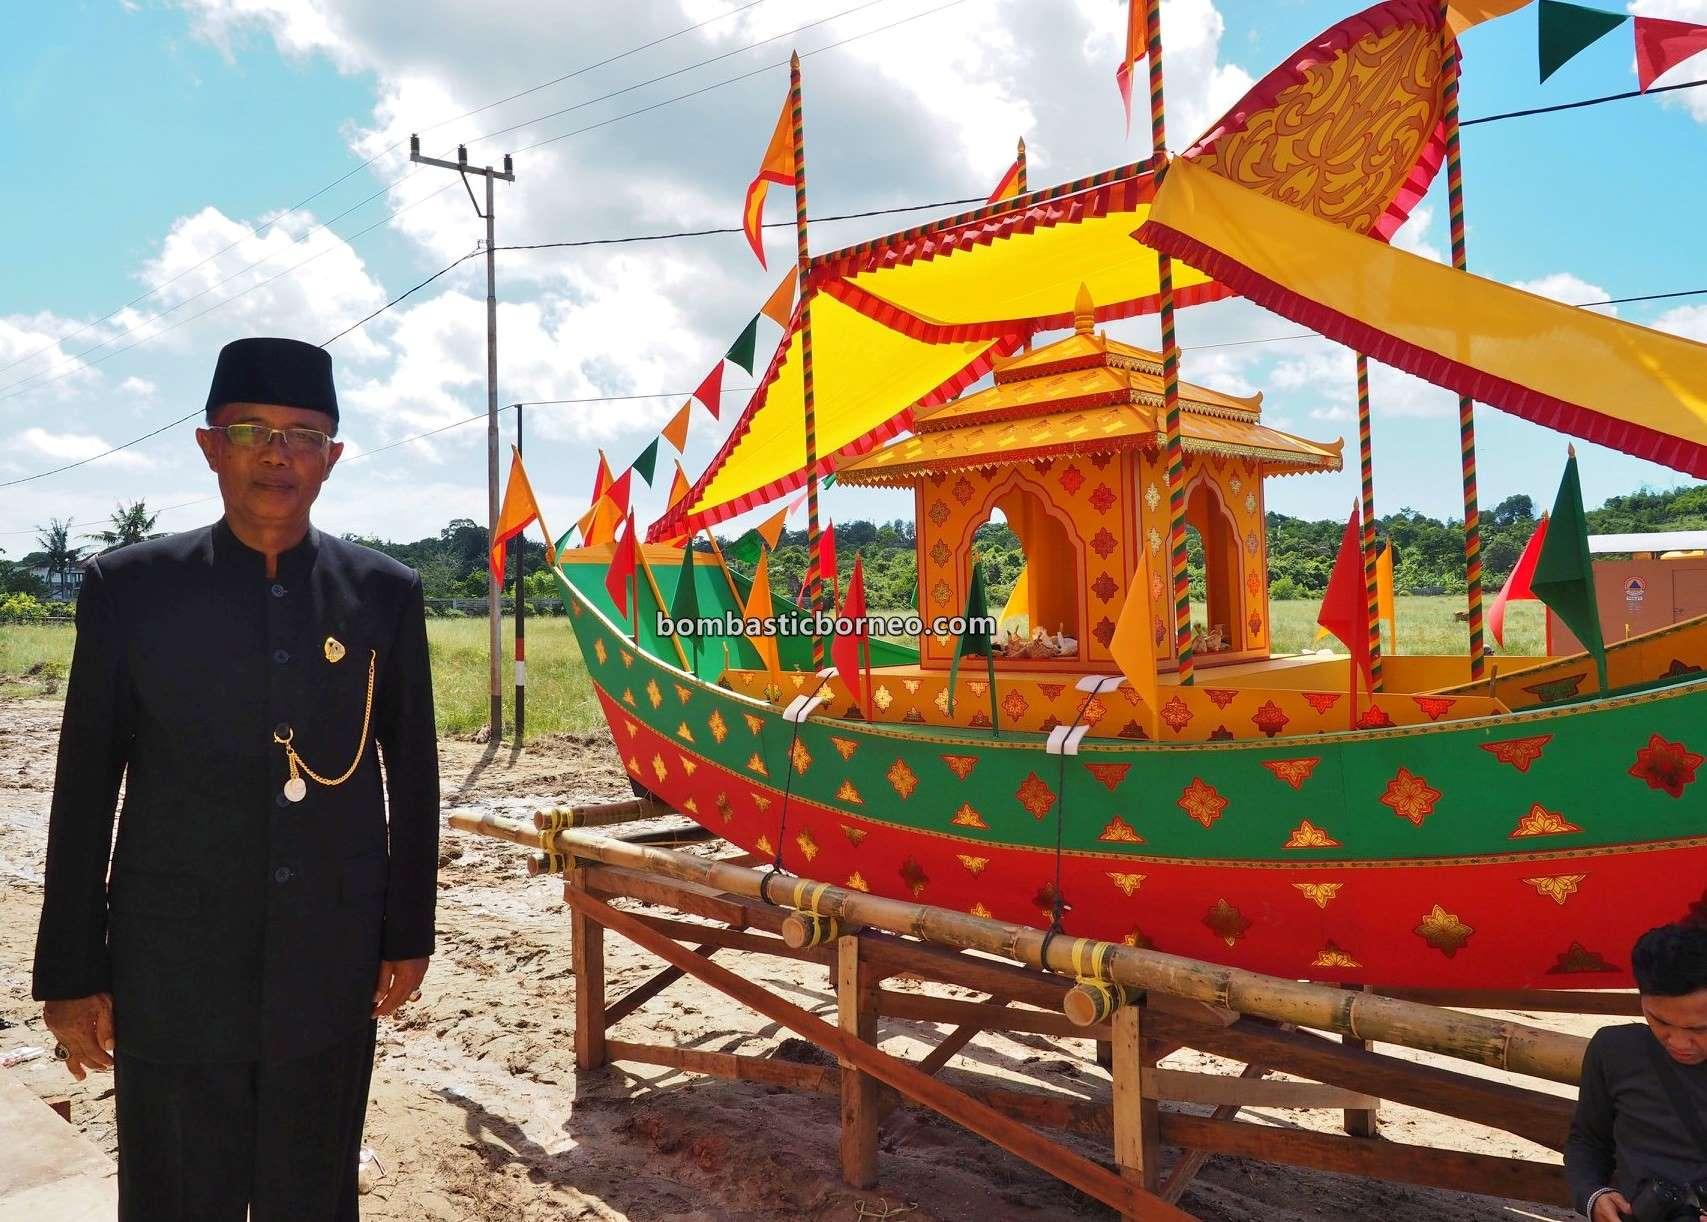 Suku Dayak Tidung, upacara adat, authentic, traditional, ritual, native, tribal, Indonesia, North Kalimantan, Tarakan, Tourism, Trans Borneo, 探索婆罗洲游踪, 印尼北加里曼丹, 打拉根原住民文化